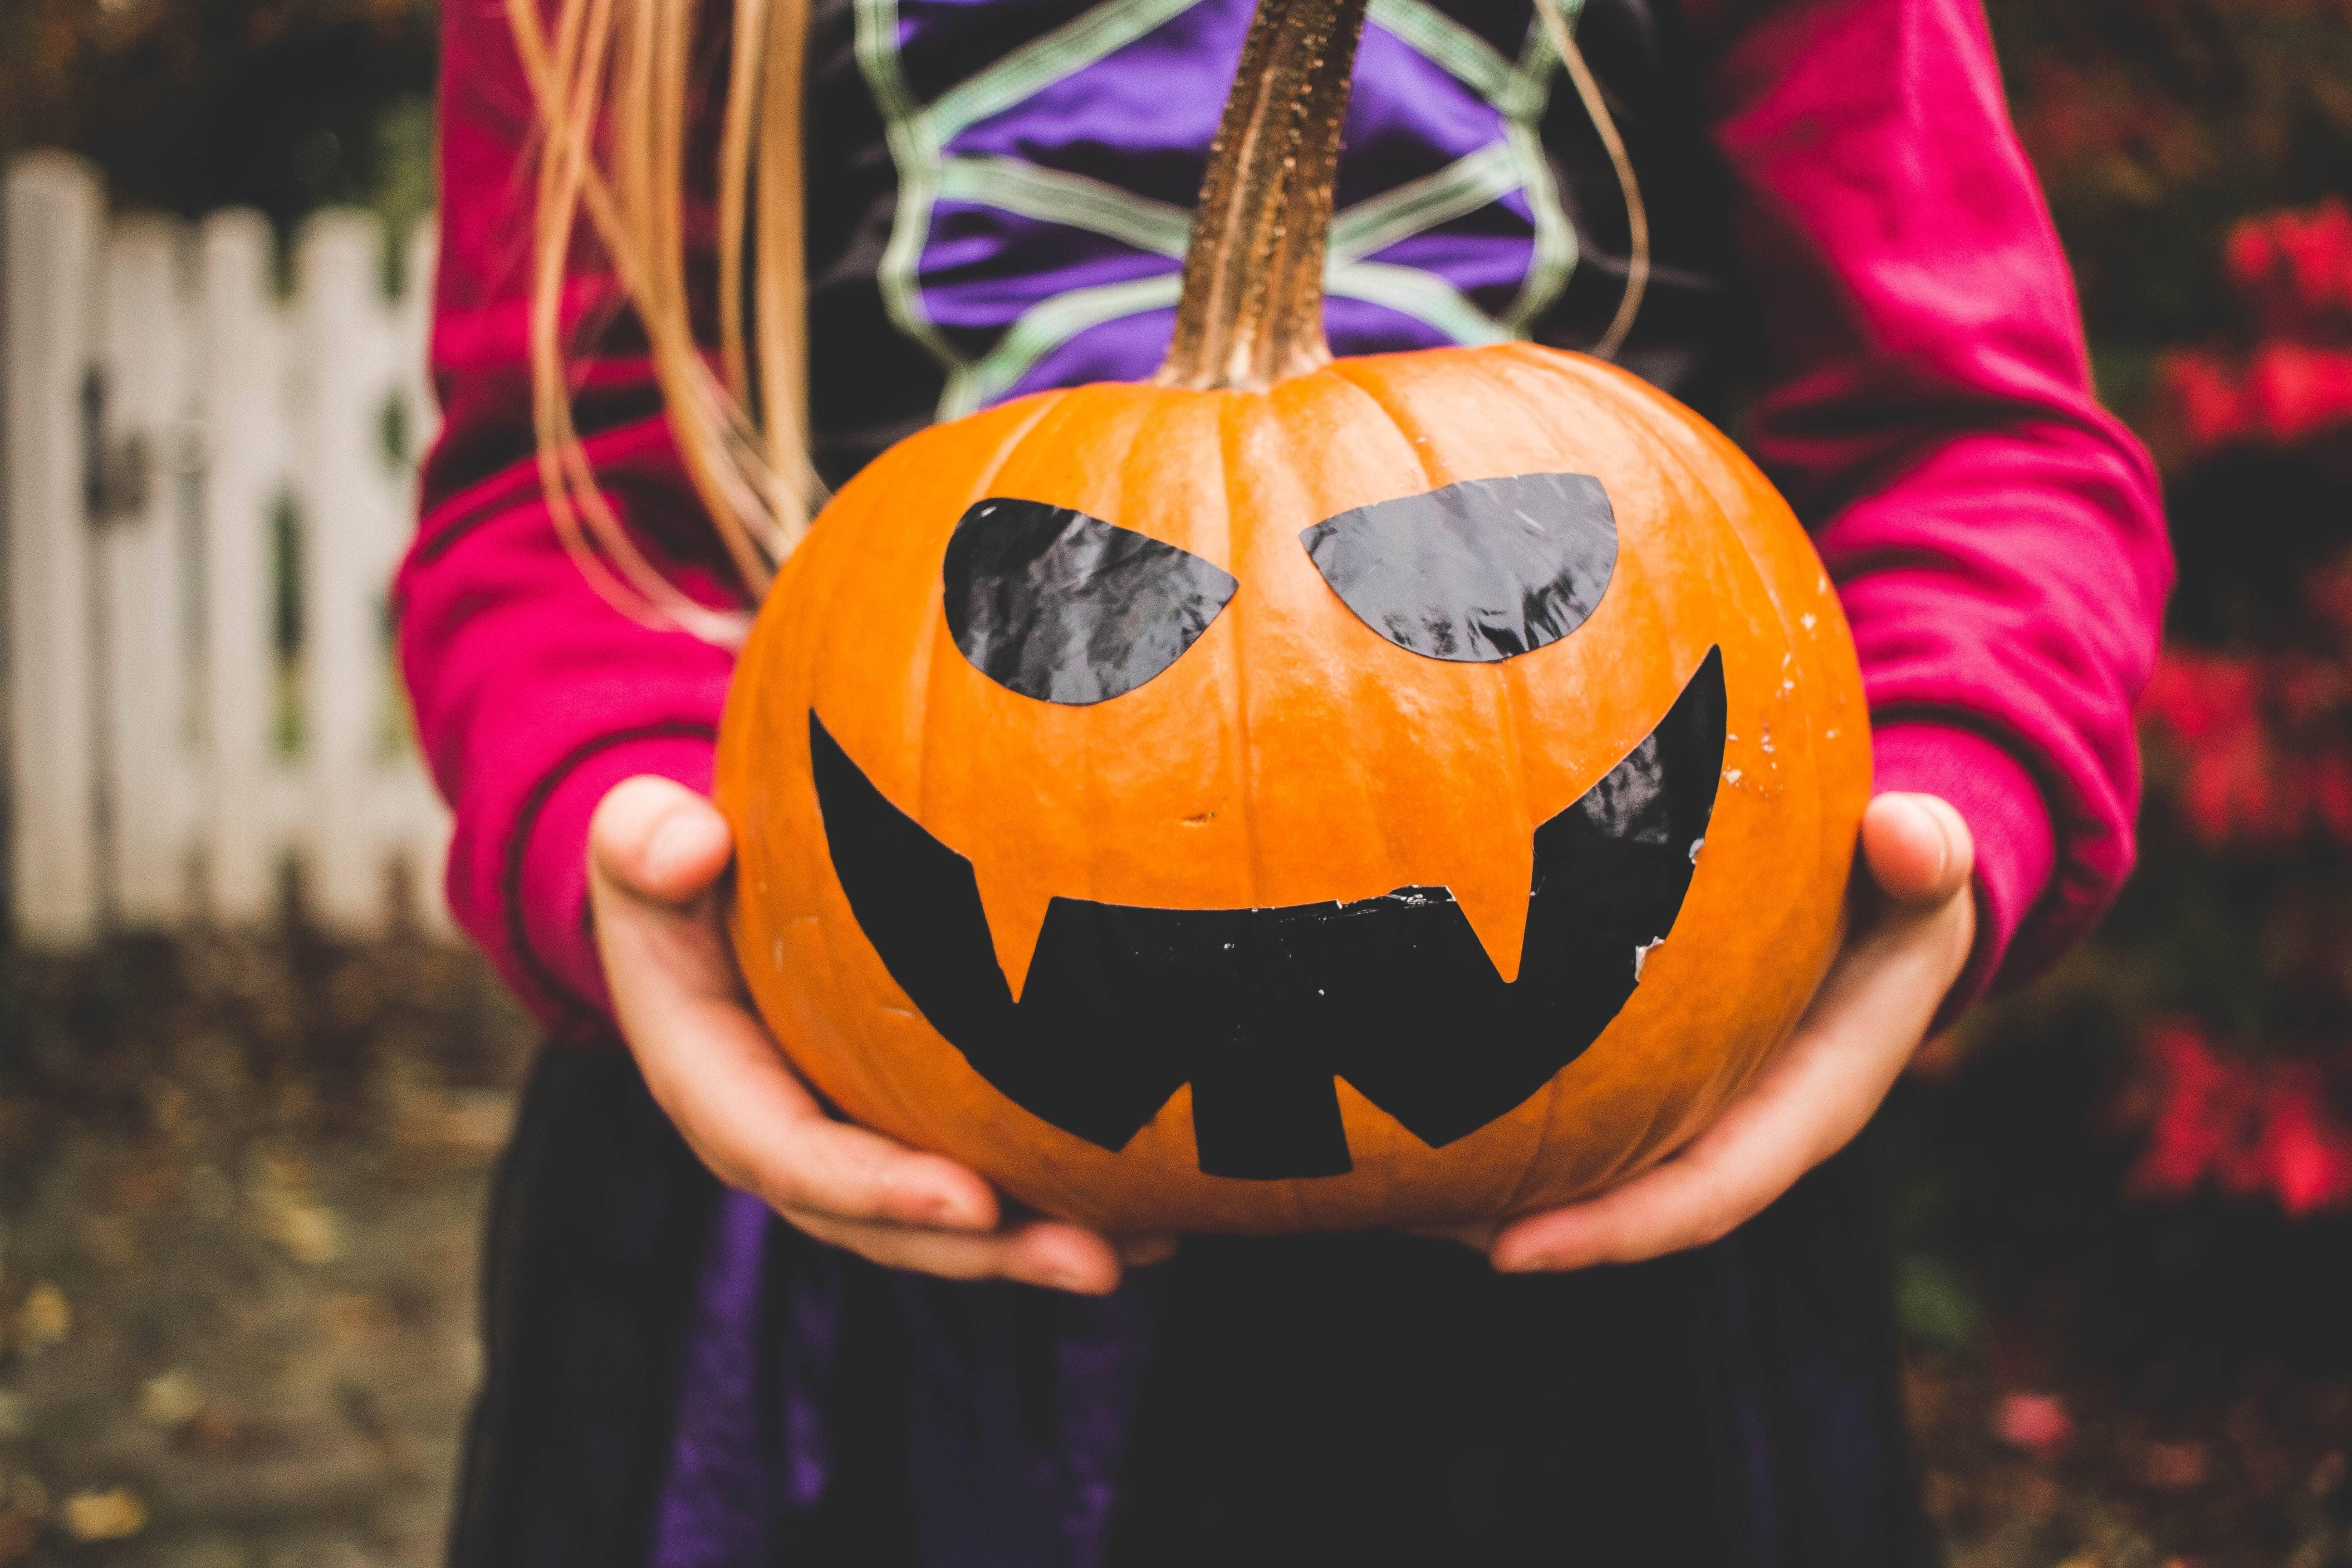 halloween surprises for school aged ghouls image courtesy unsplash user julia raasch